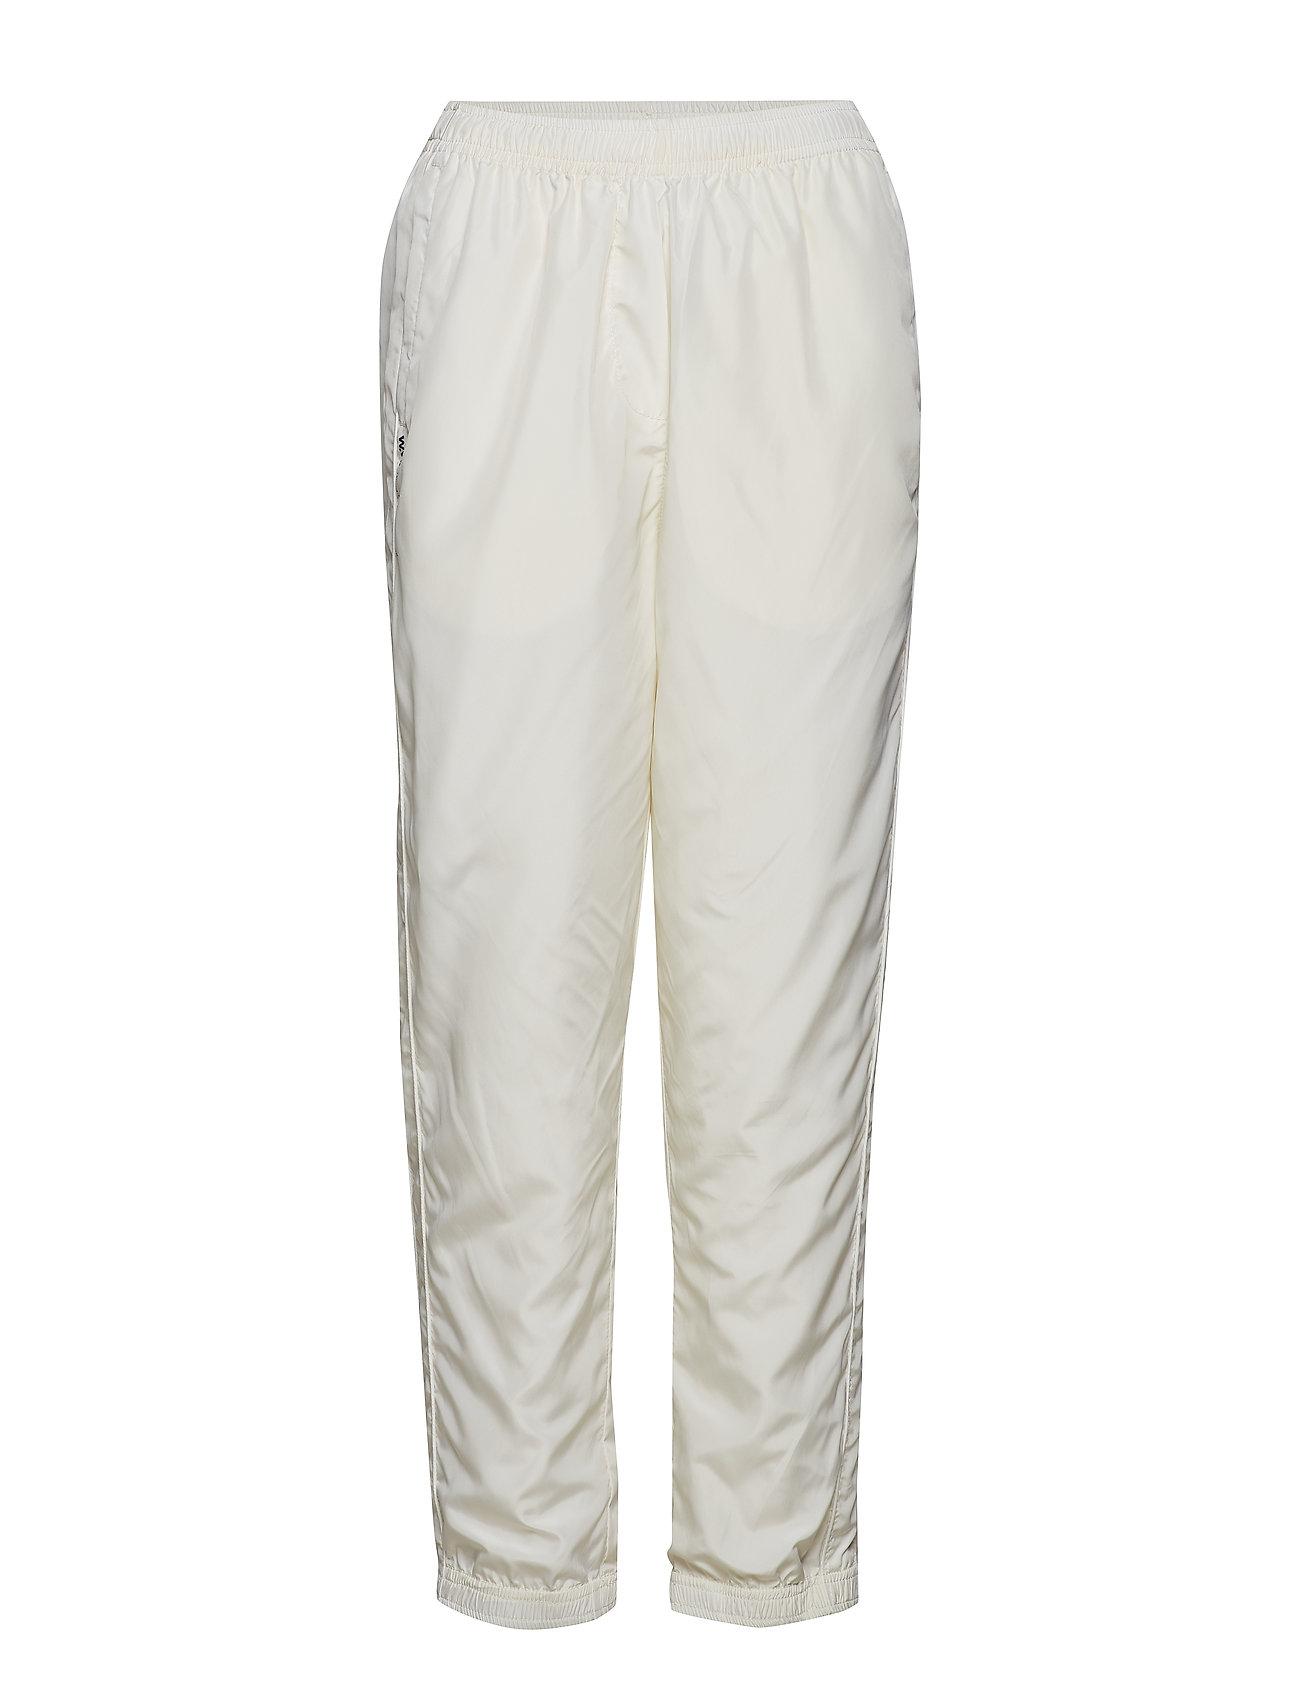 Wood Wood Mitzi trousers - OFF-WHITE